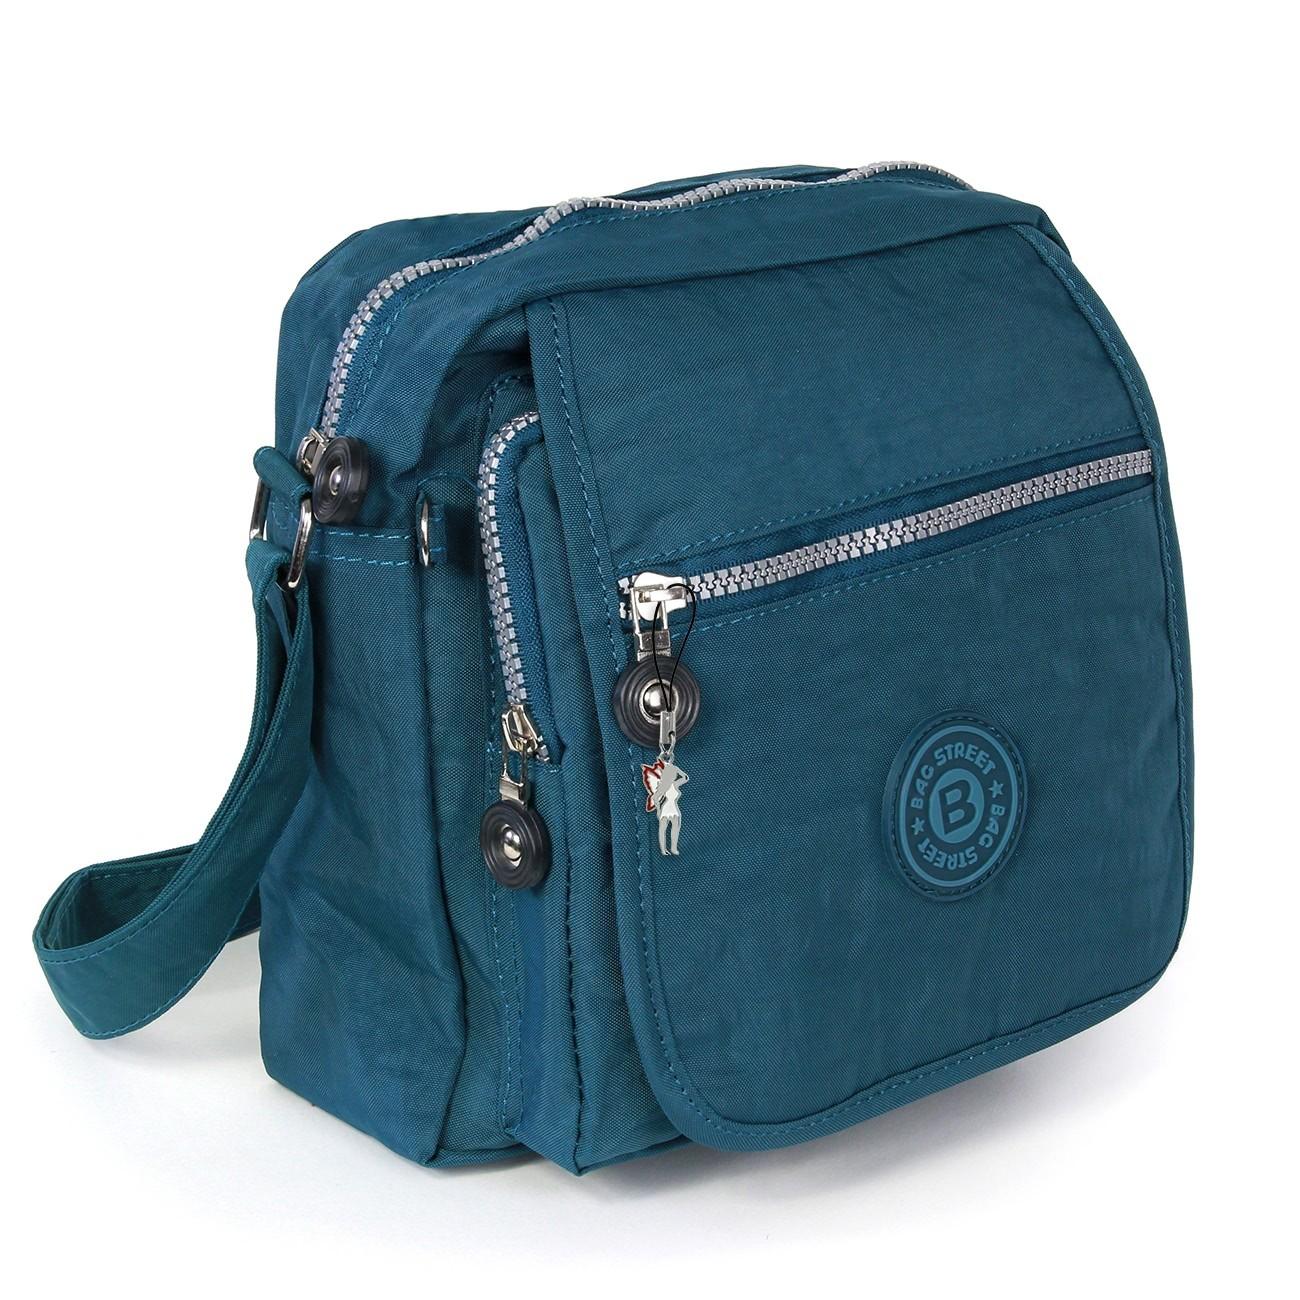 Umhängetasche Nylon blau Schultertasche Crossbody Bag Street OTJ218B